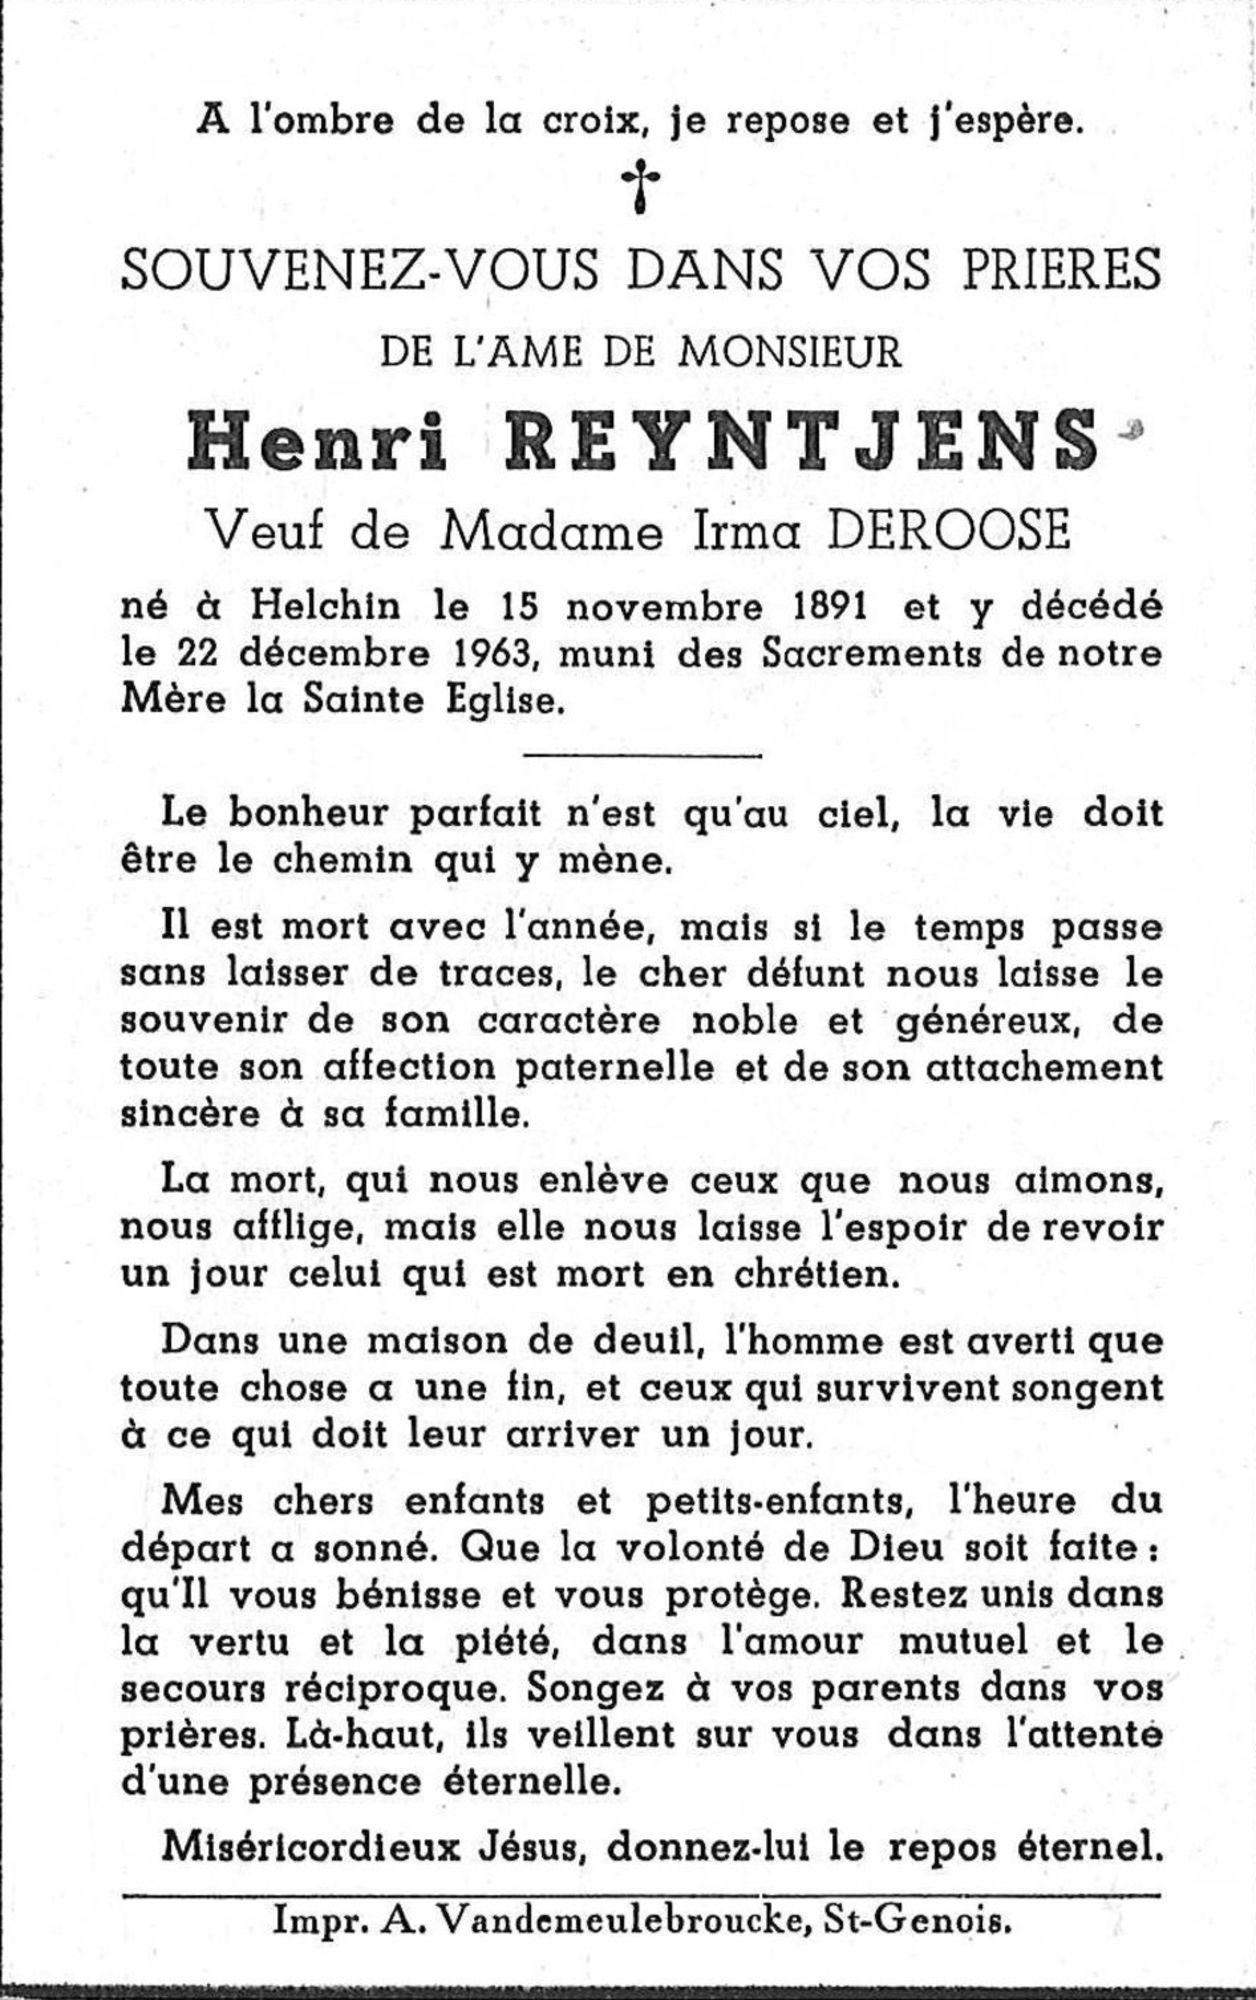 Henri Reyntjens